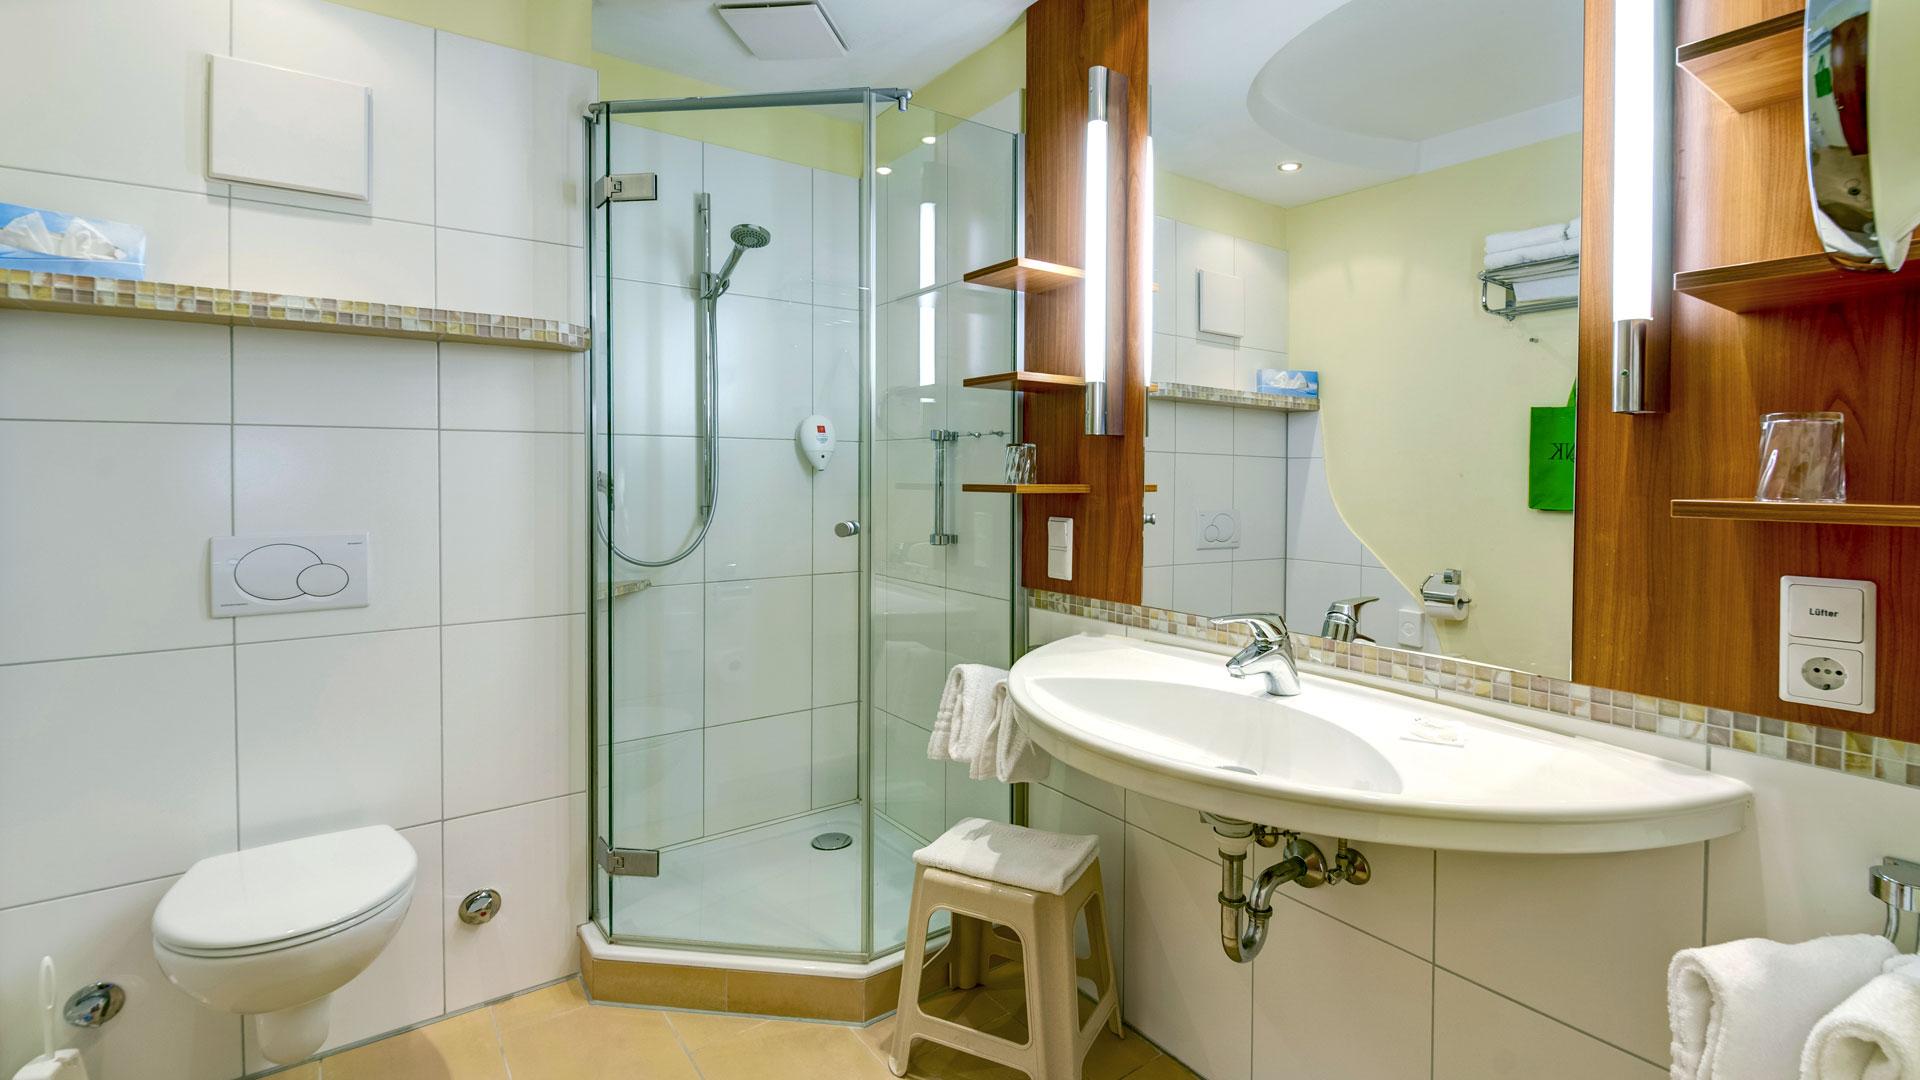 Badezimmer vom DZ Therme